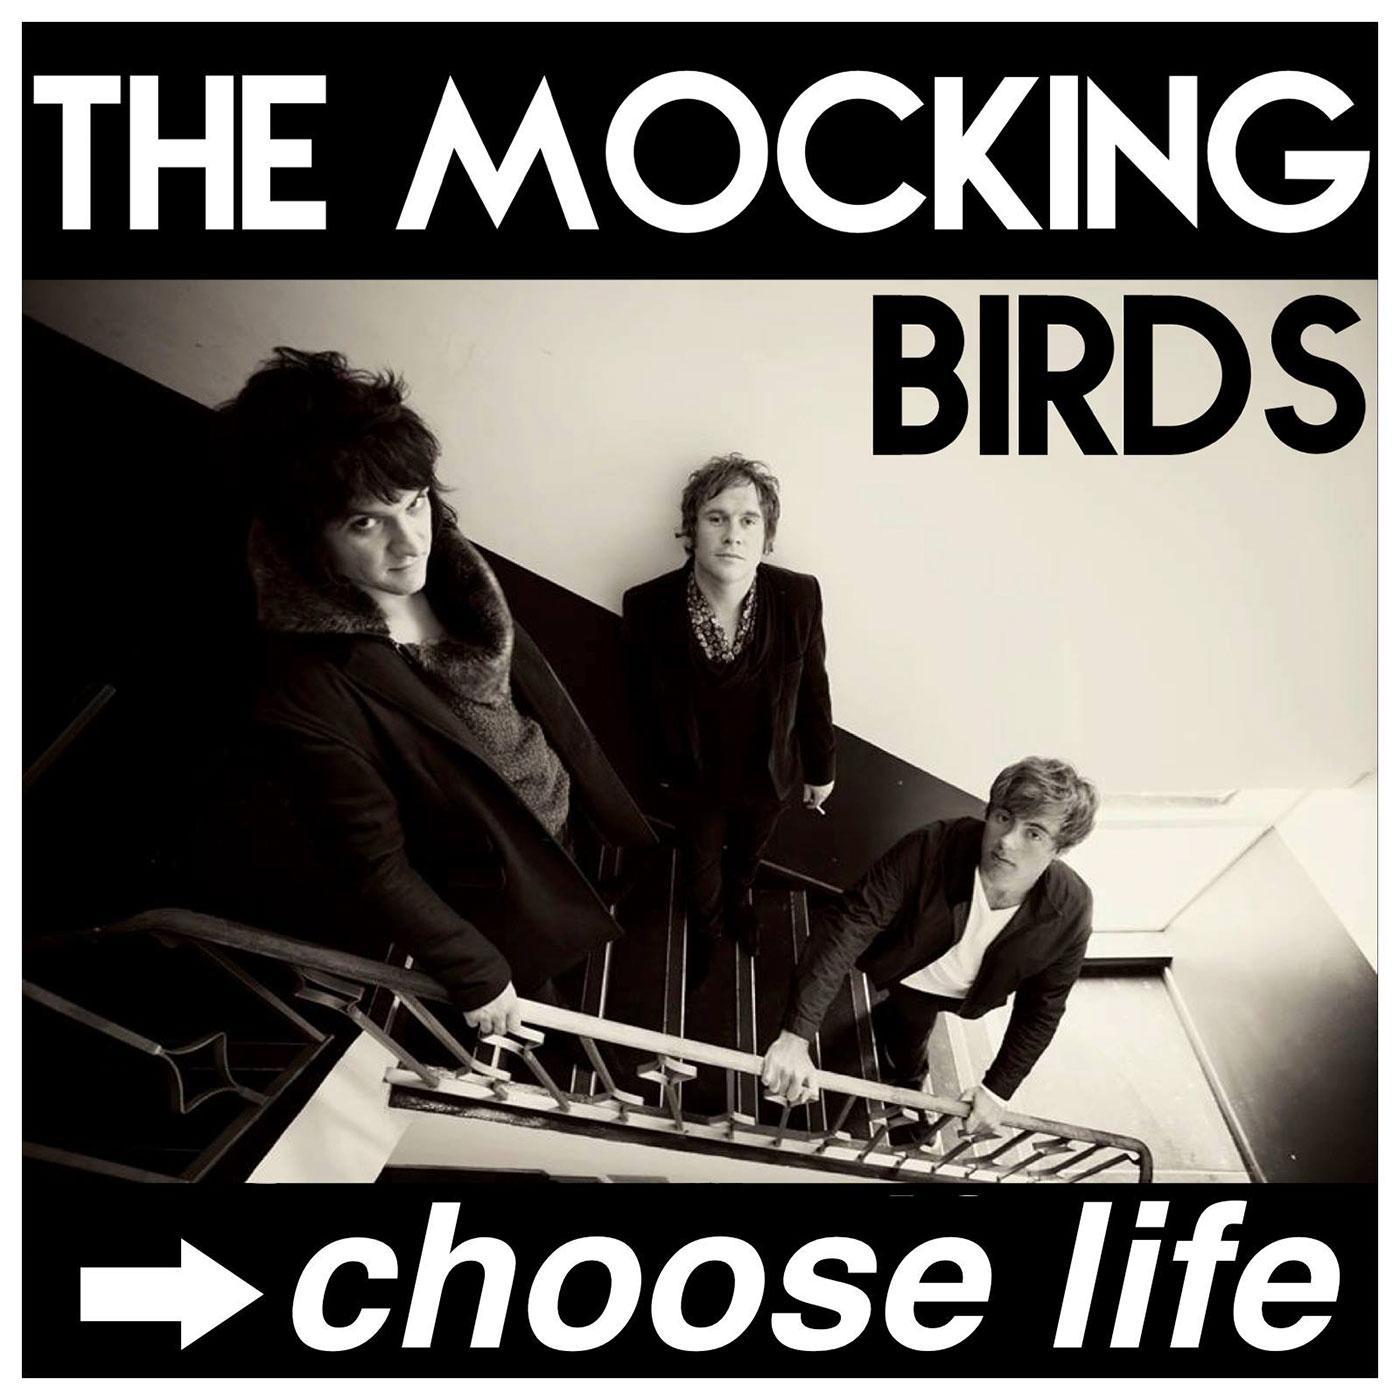 The Mocking Birds 'Choose Life' CD - Signed Copy